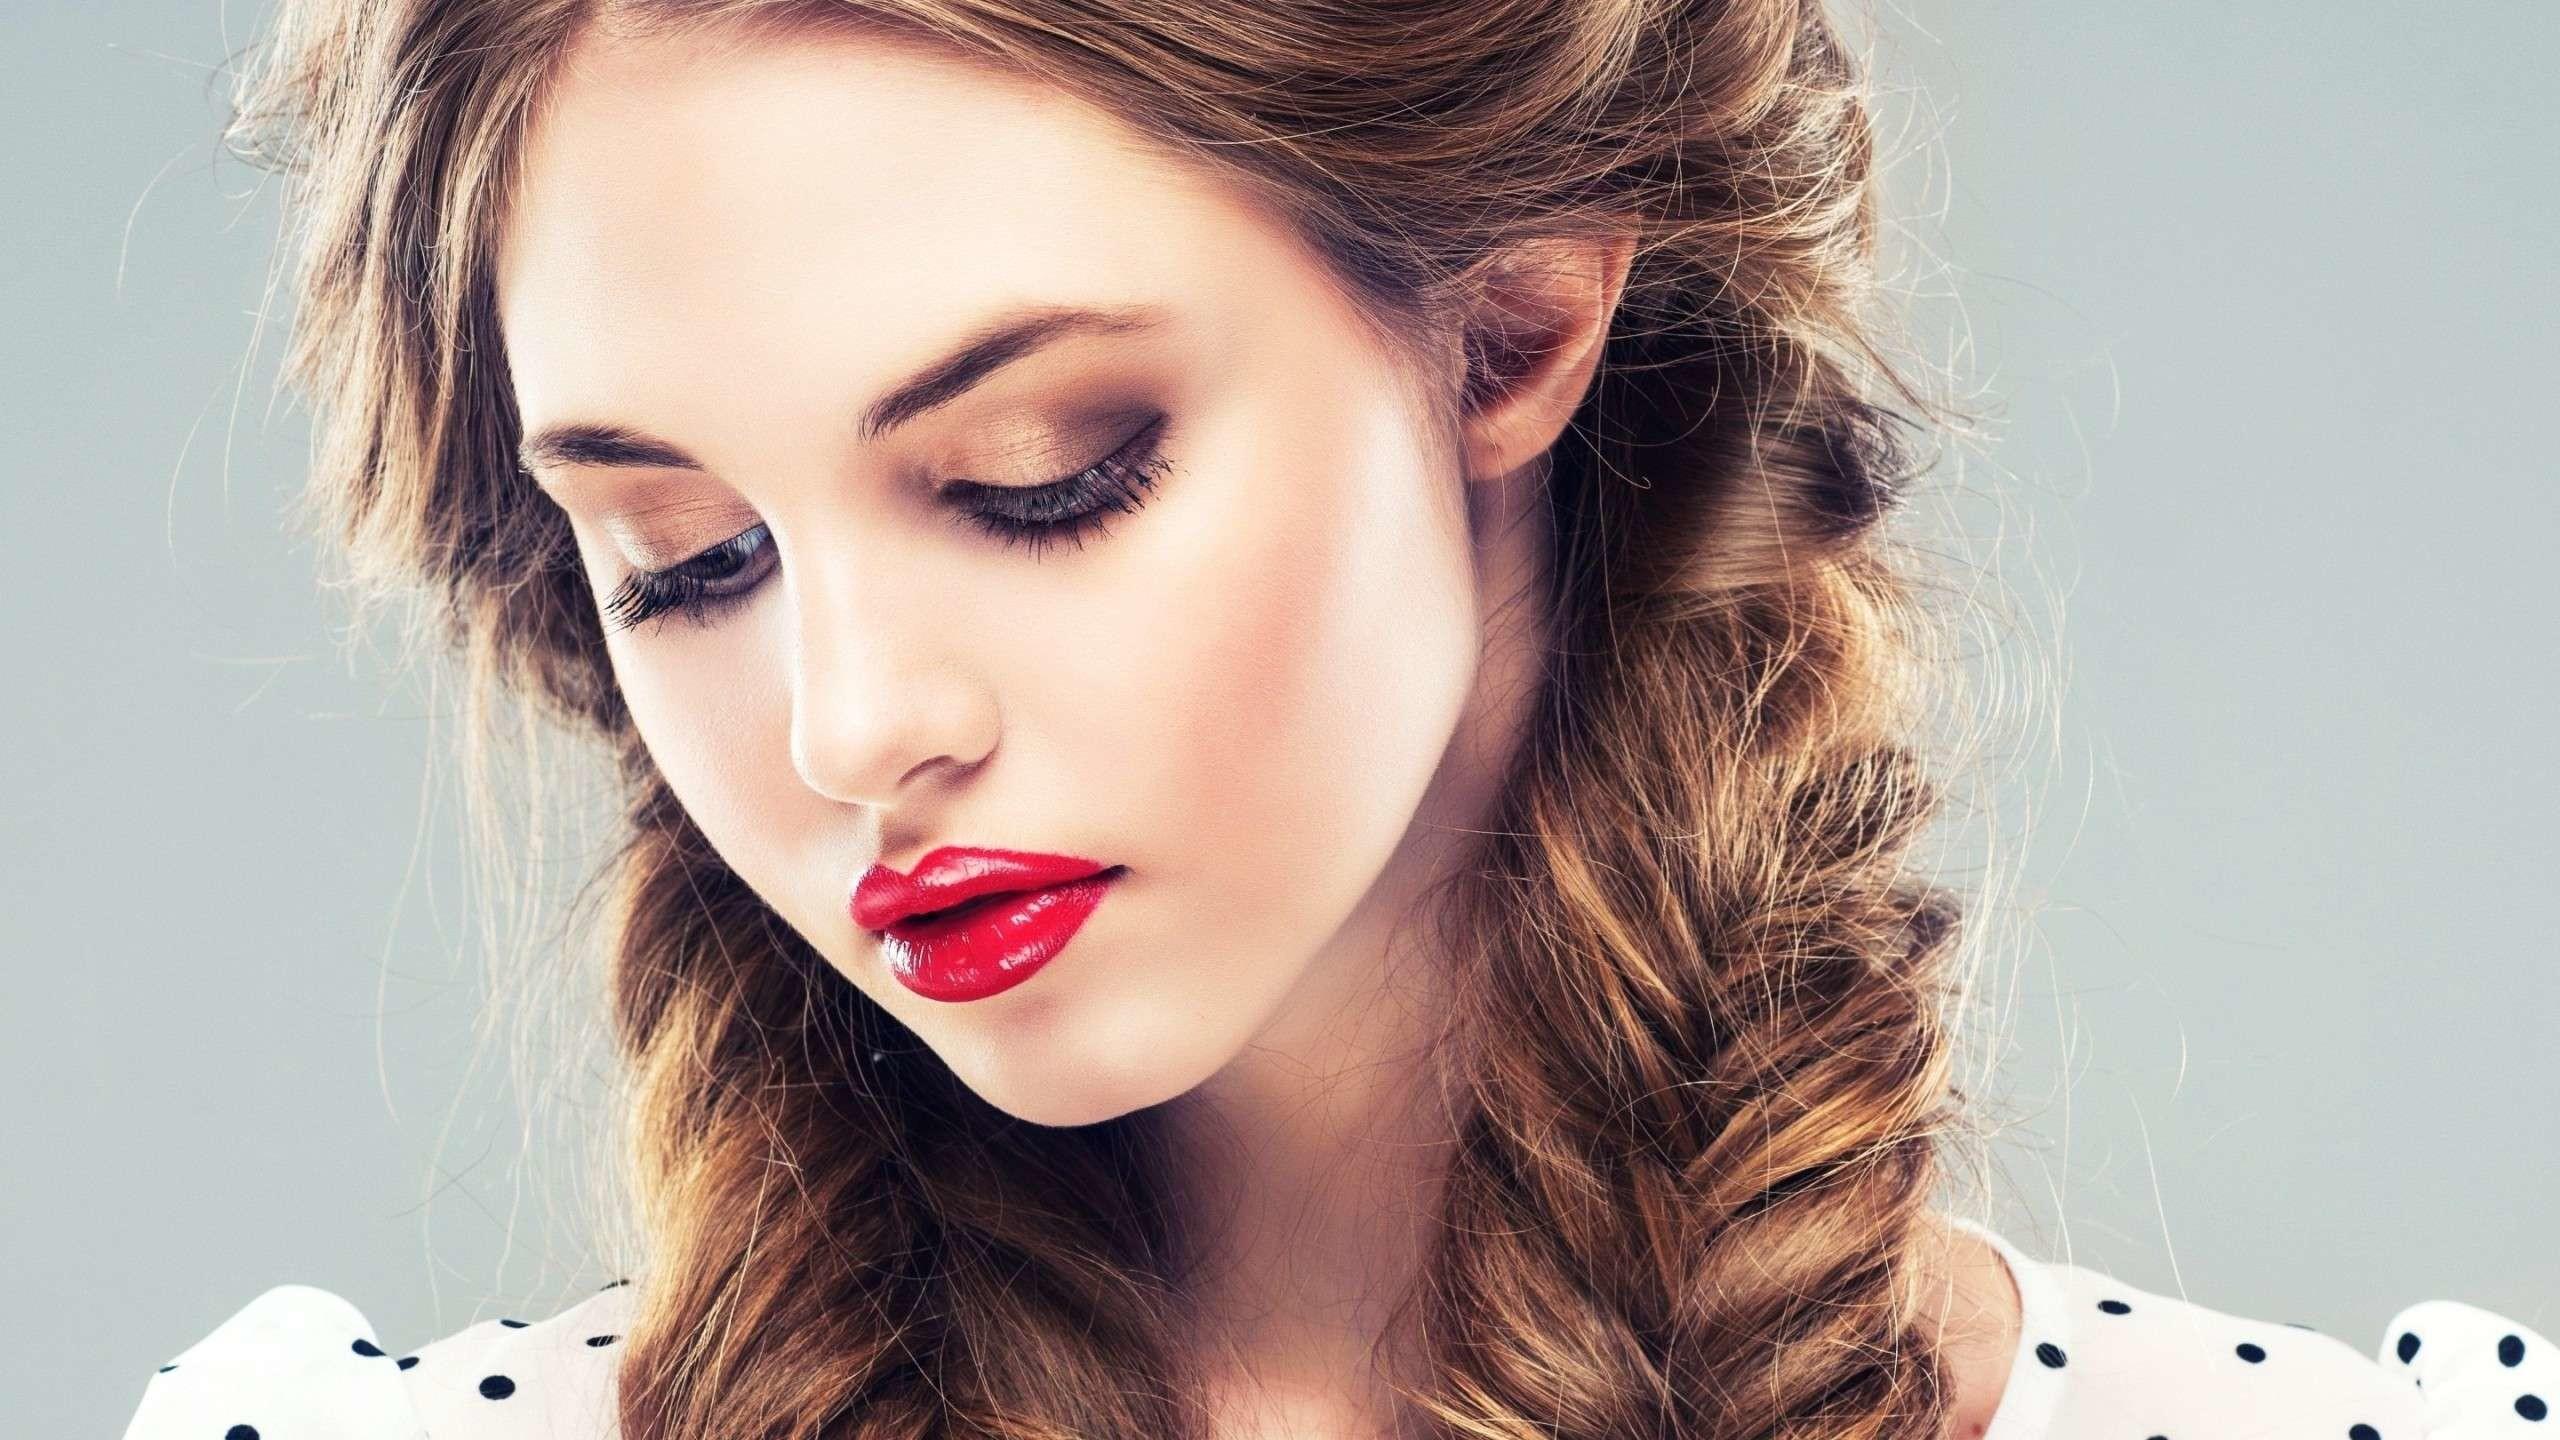 Most Beautiful Women HD Wallpaper (64+ images)